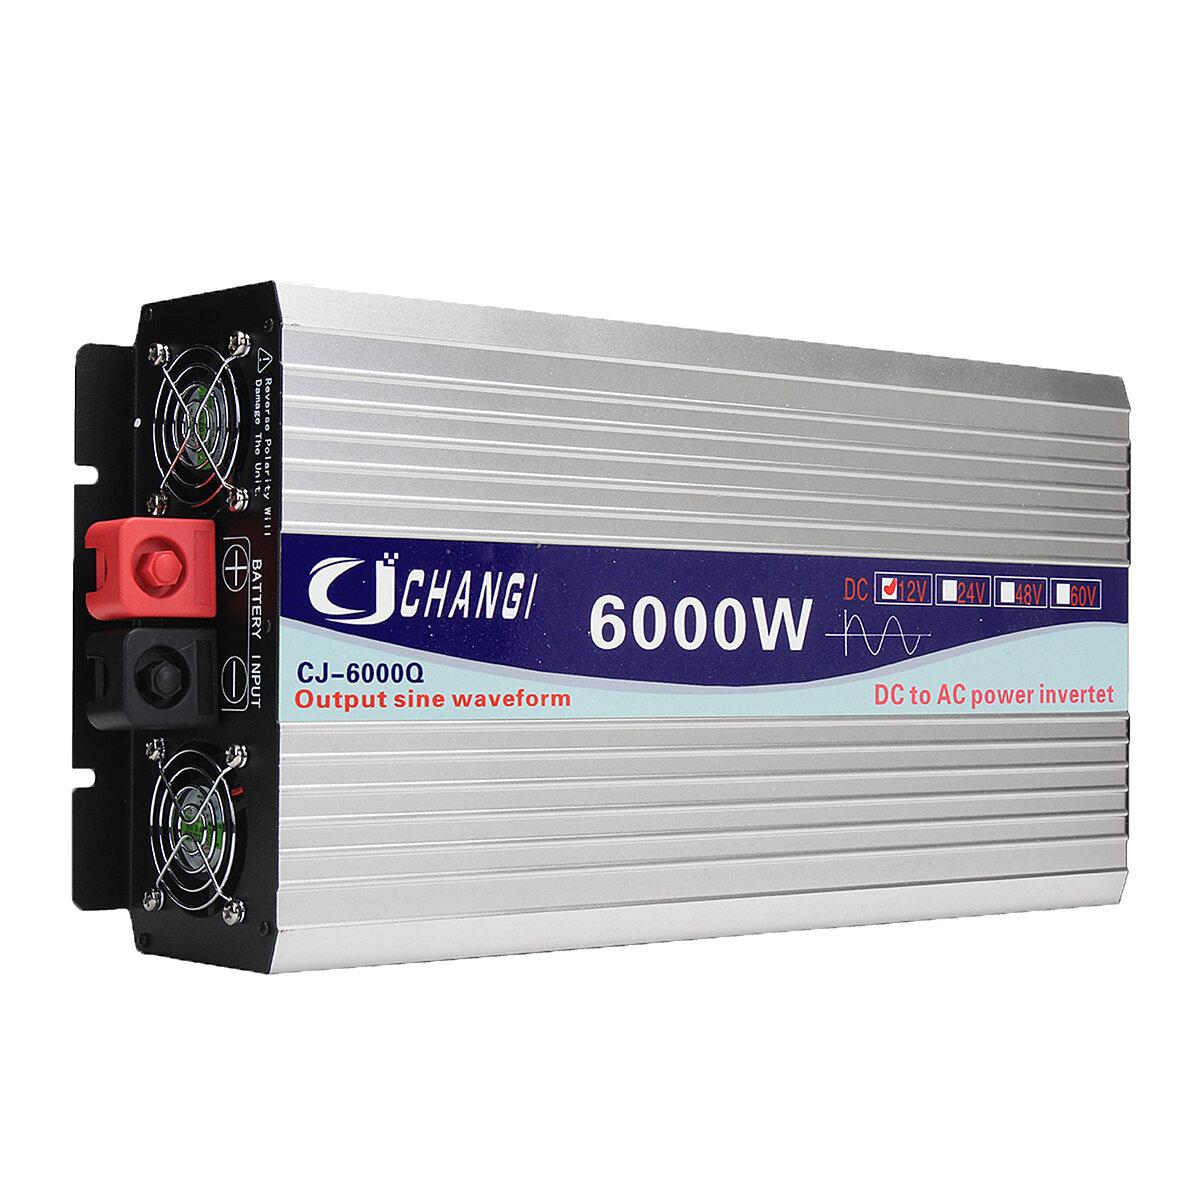 Intelligent Solar Pure Sine Wave Inverter 12V / 24V till 110V 3000W / 4000W / 5000W / 6000W Power Converter